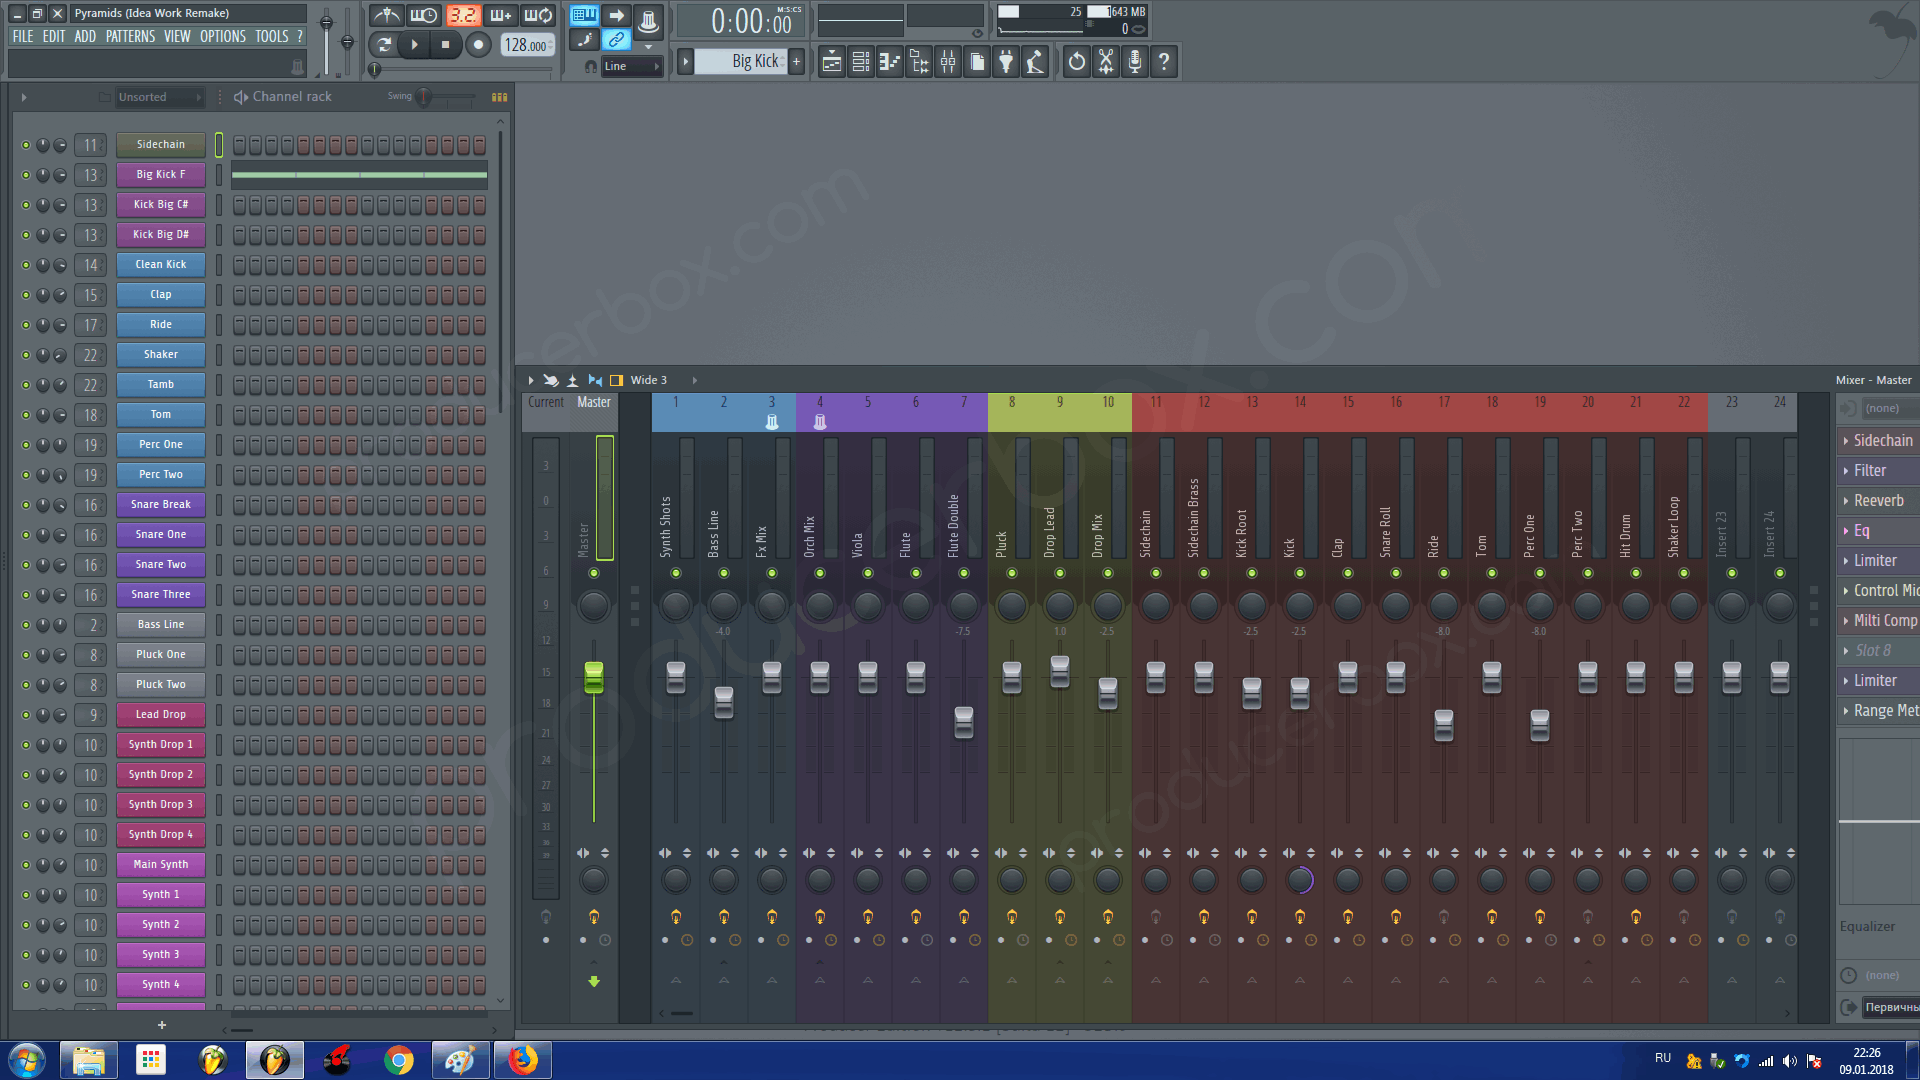 4 in 1 Electro House FL Studio Templates Bundle (DVBBS, Dropgun Style)